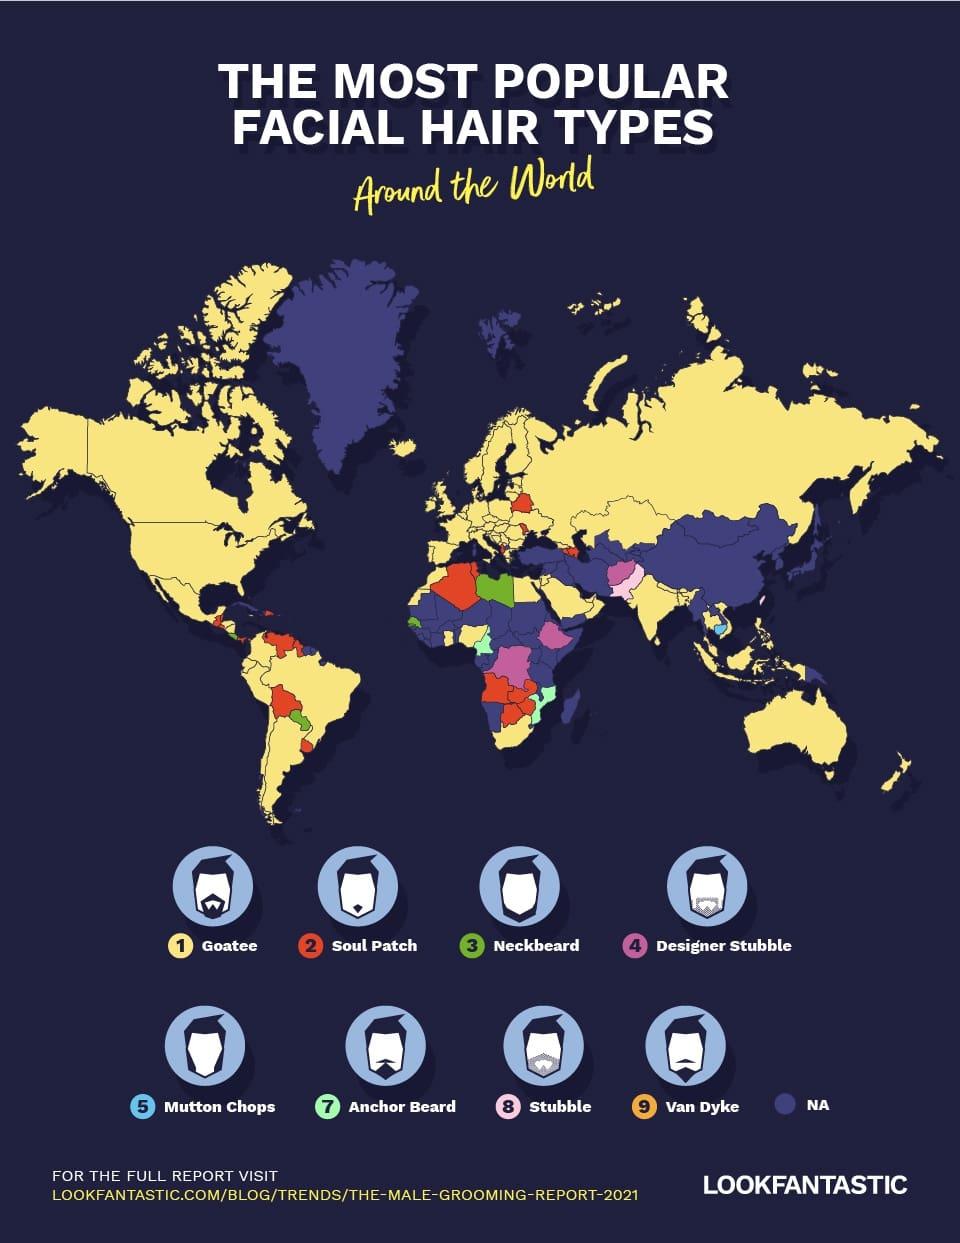 popular facial hair around the world